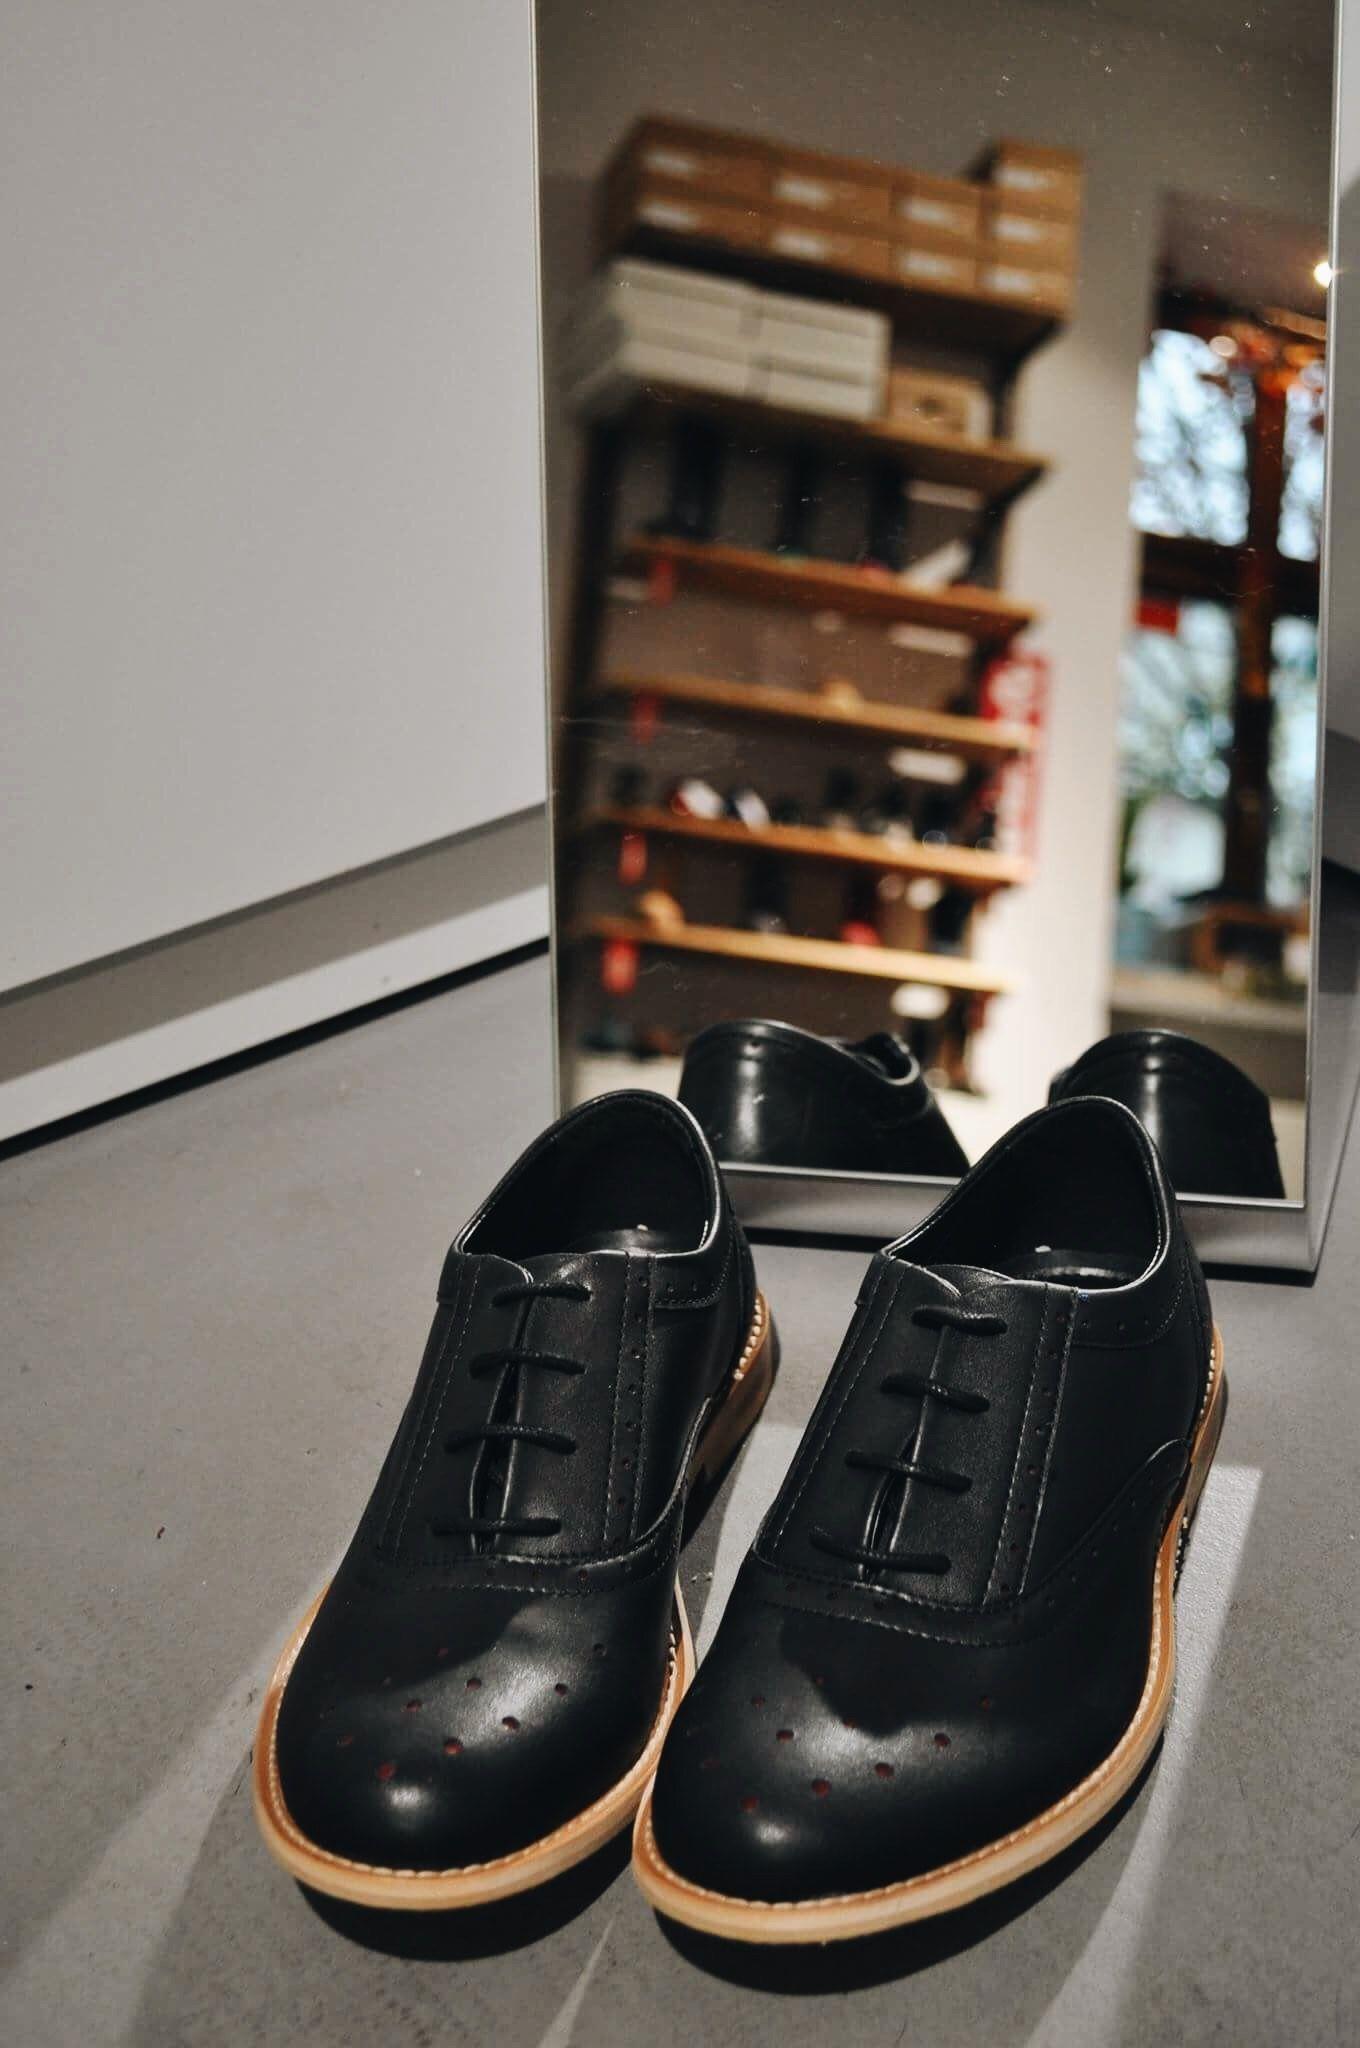 Oxfordy Czarne Perforated Oxfords Marki Wills London Dress Shoes Men Vegan Shoes Shoes